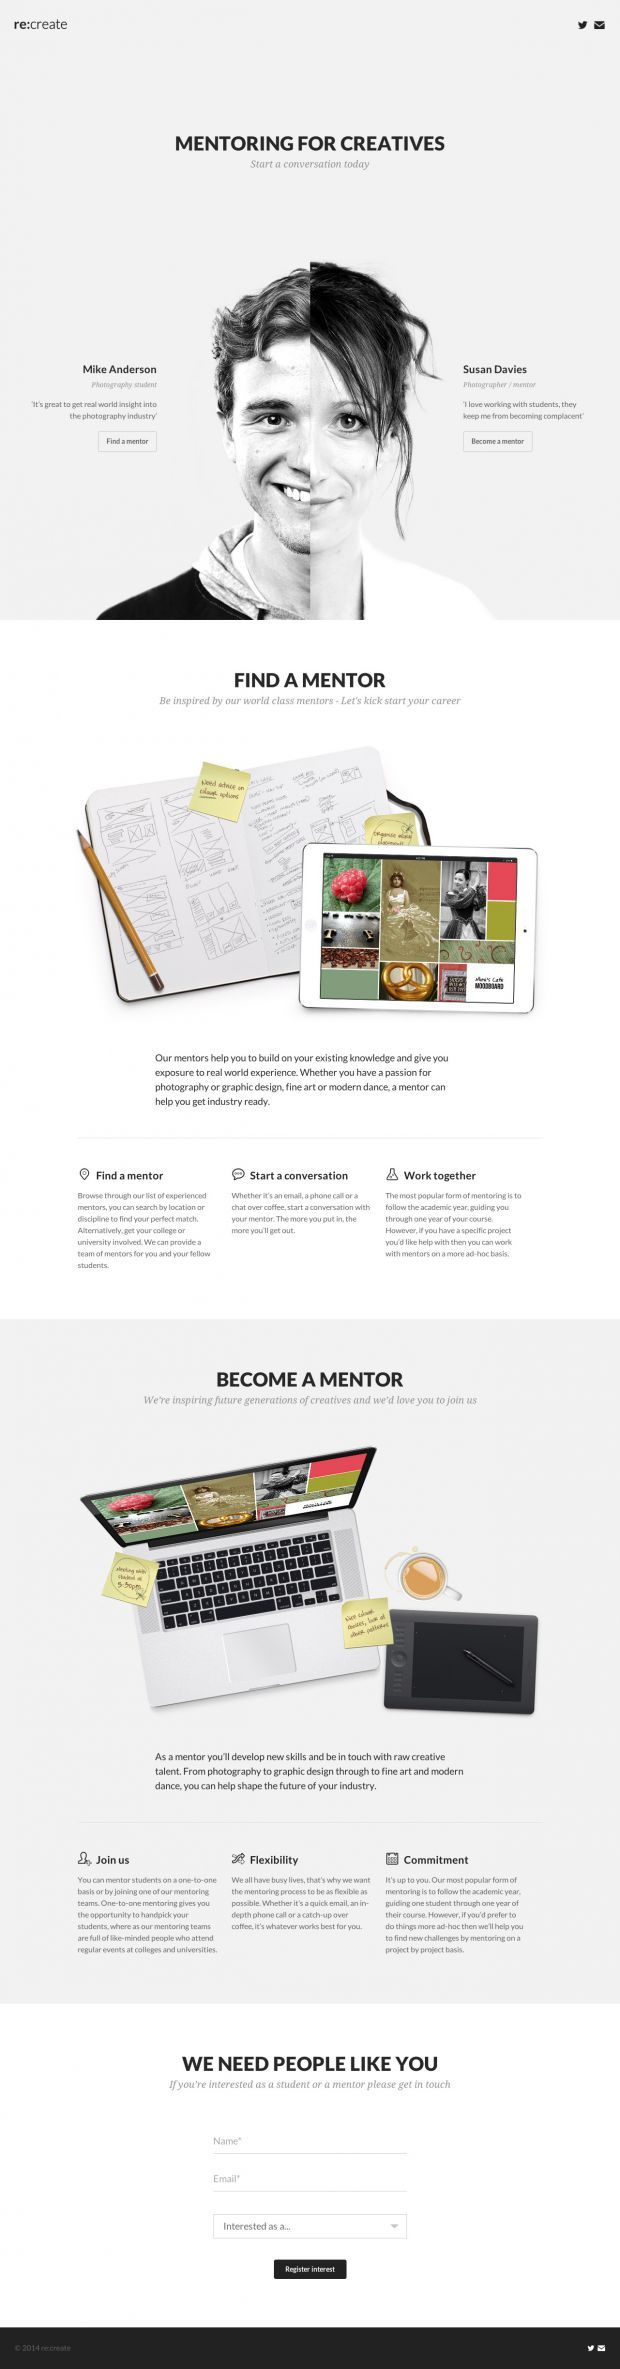 Mentoring for Creatives - www.niceoneilike.com - #portfolio #html5 #responsive #design #creative #graphic #inspiration #scrolling #site #photography